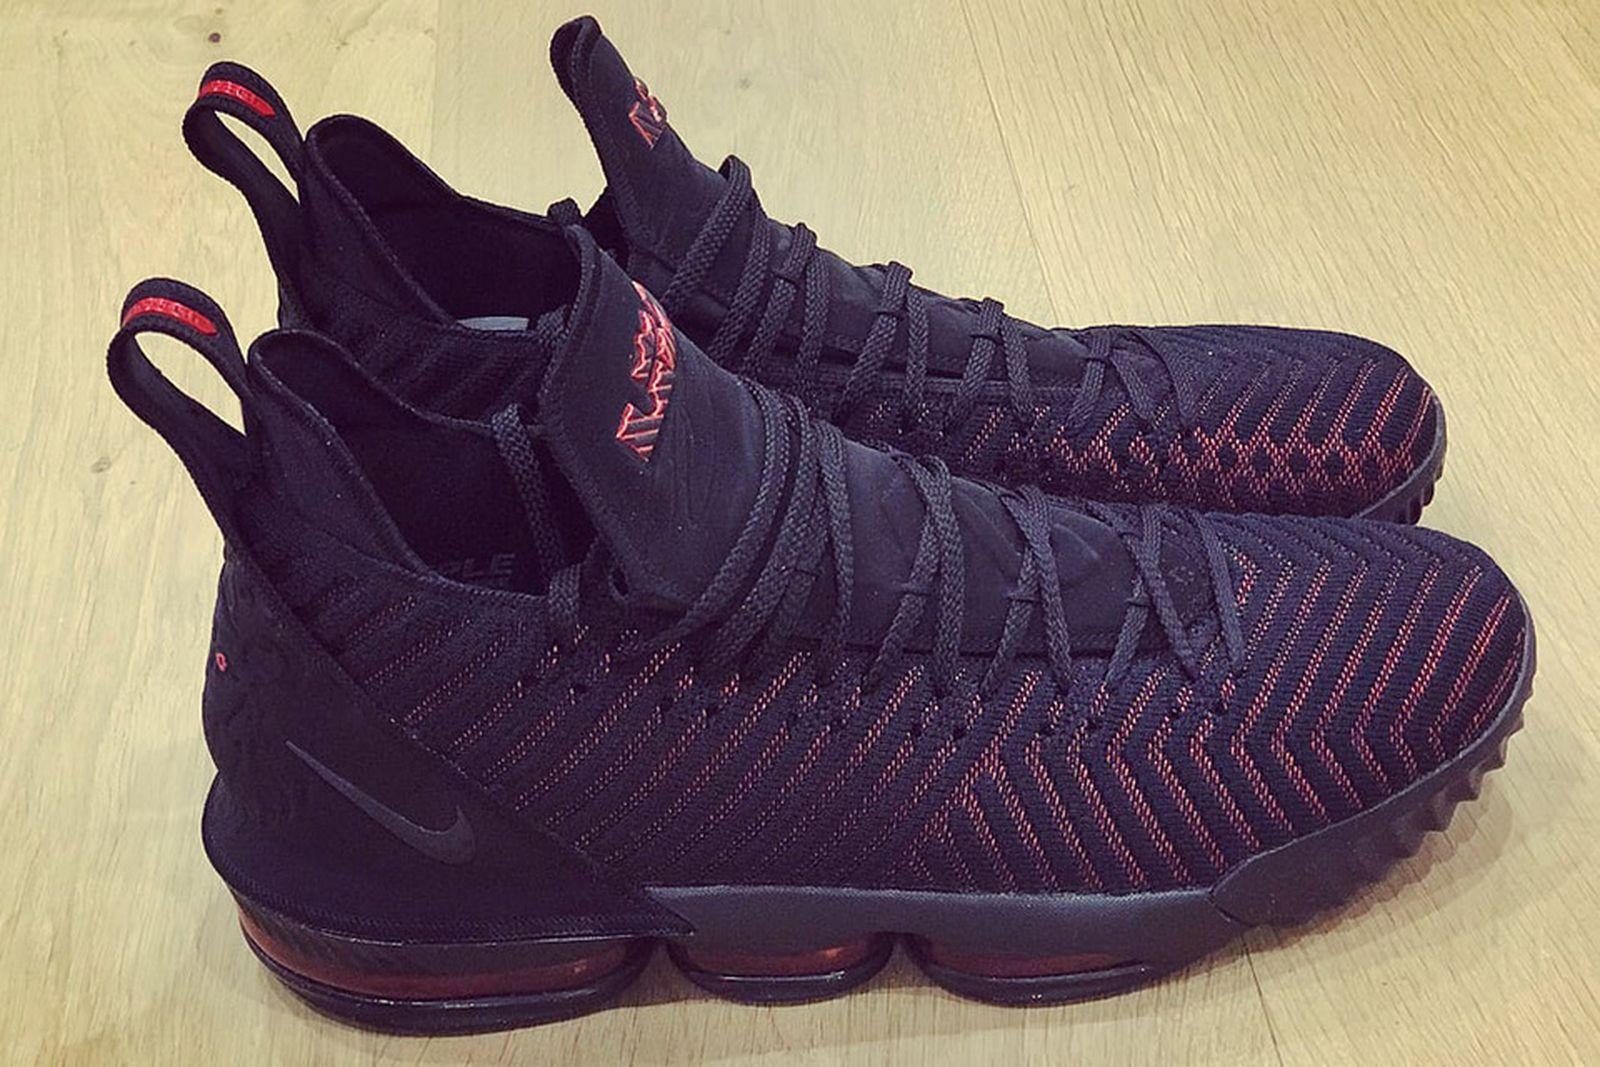 Nike LeBron 16: First Look